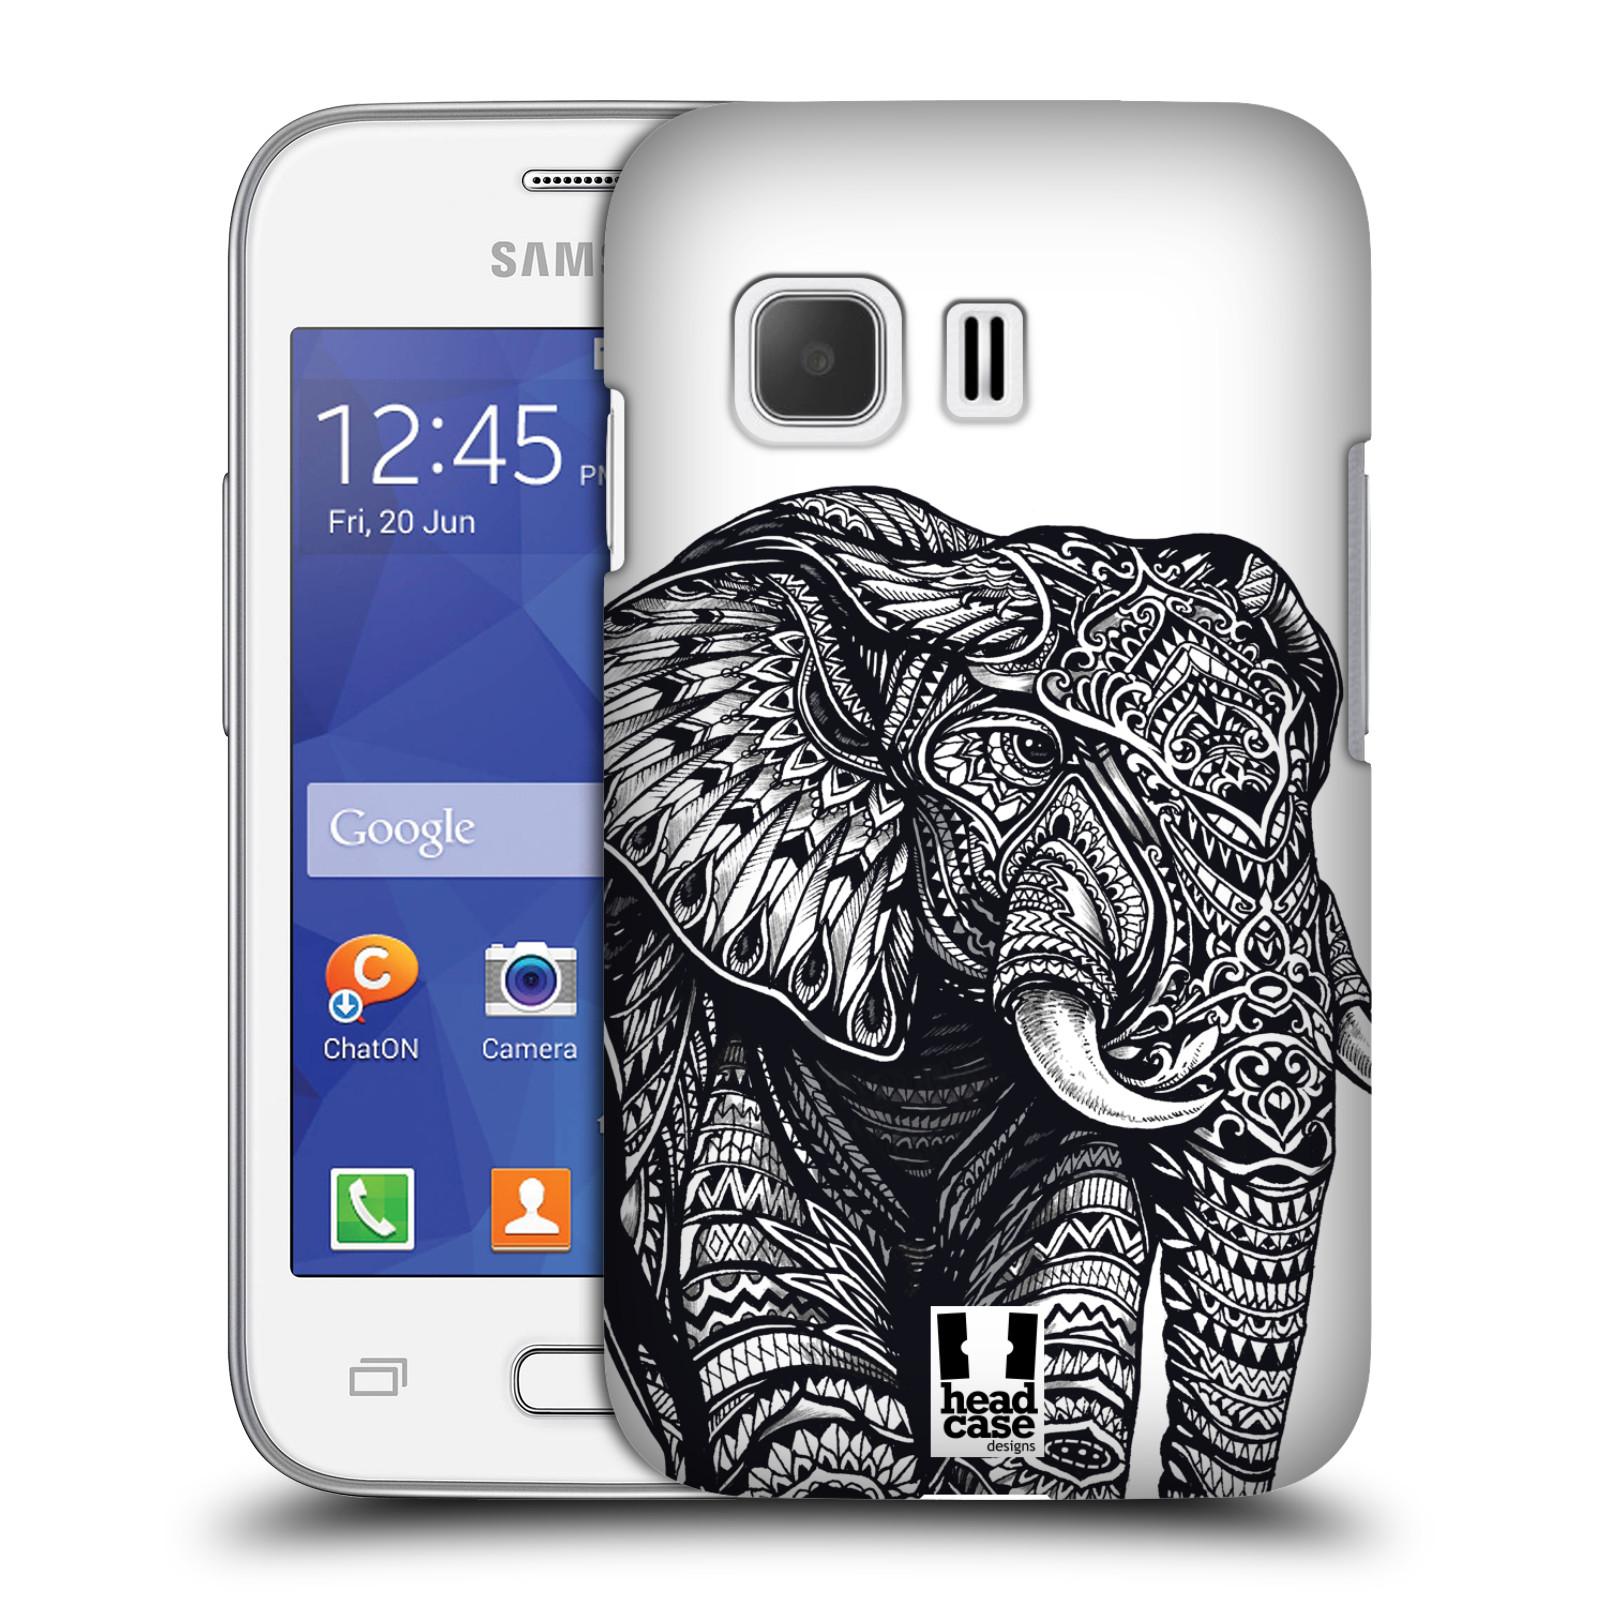 Plastové pouzdro na mobil Samsung Galaxy Young 2 HEAD CASE Zdobený Slon (Plastový kryt či obal na mobilní telefon Samsung Galaxy Young 2 SM-G130)